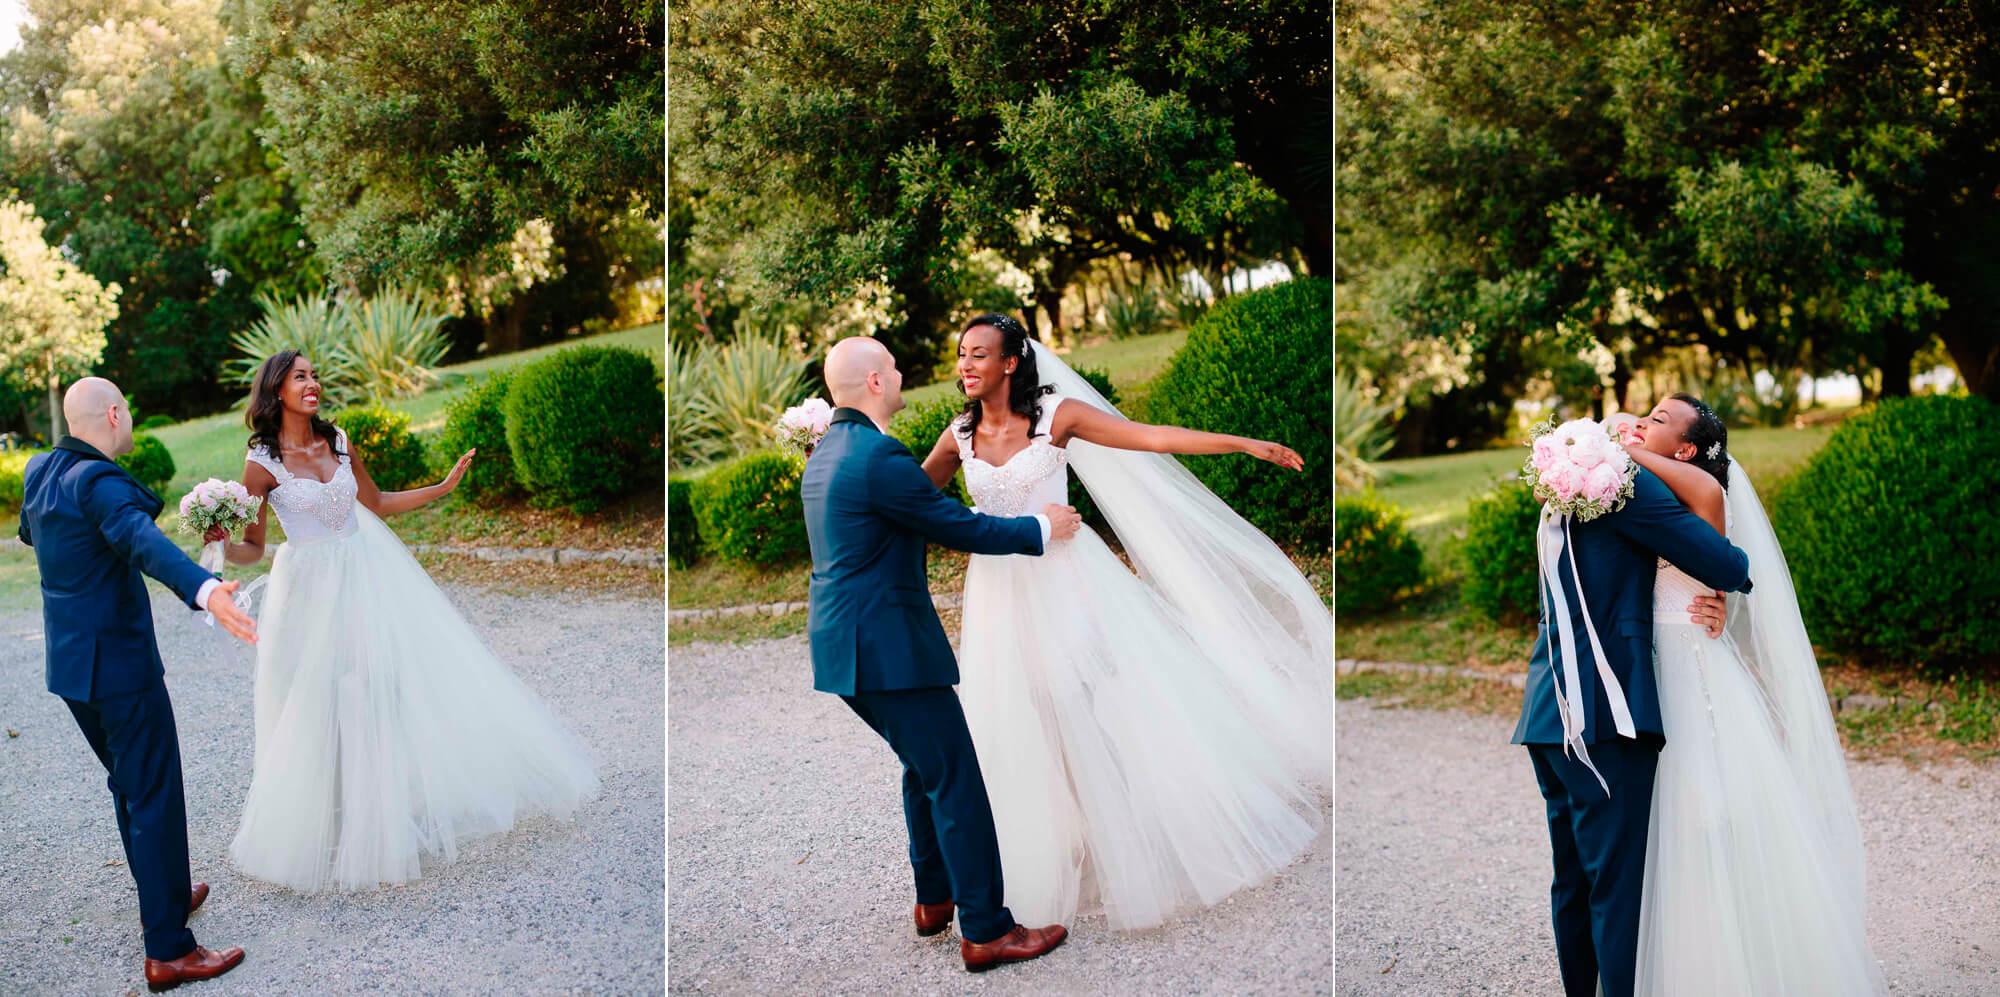 075-sorrento-wedding-photographer.jpg